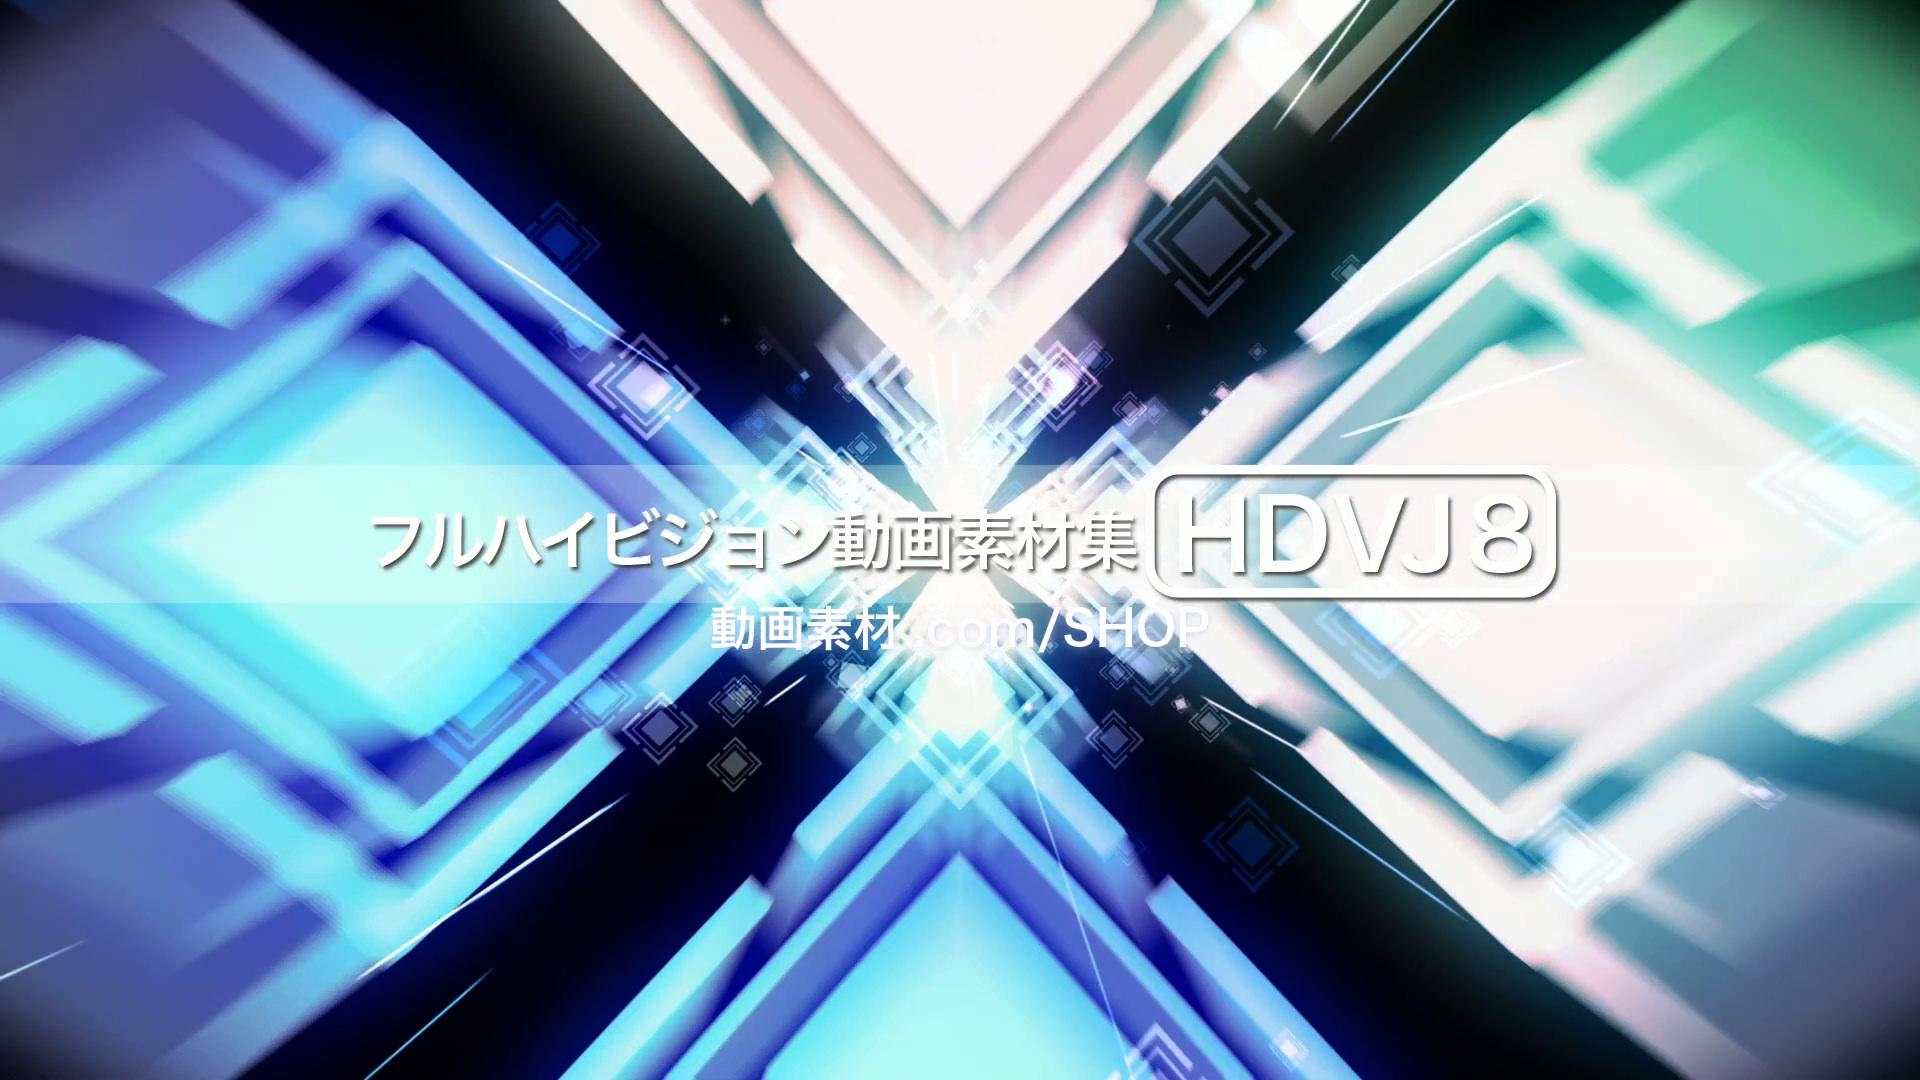 MovieMaterial HDVJ8 フルハイビジョンVJ動画素材集 画像2